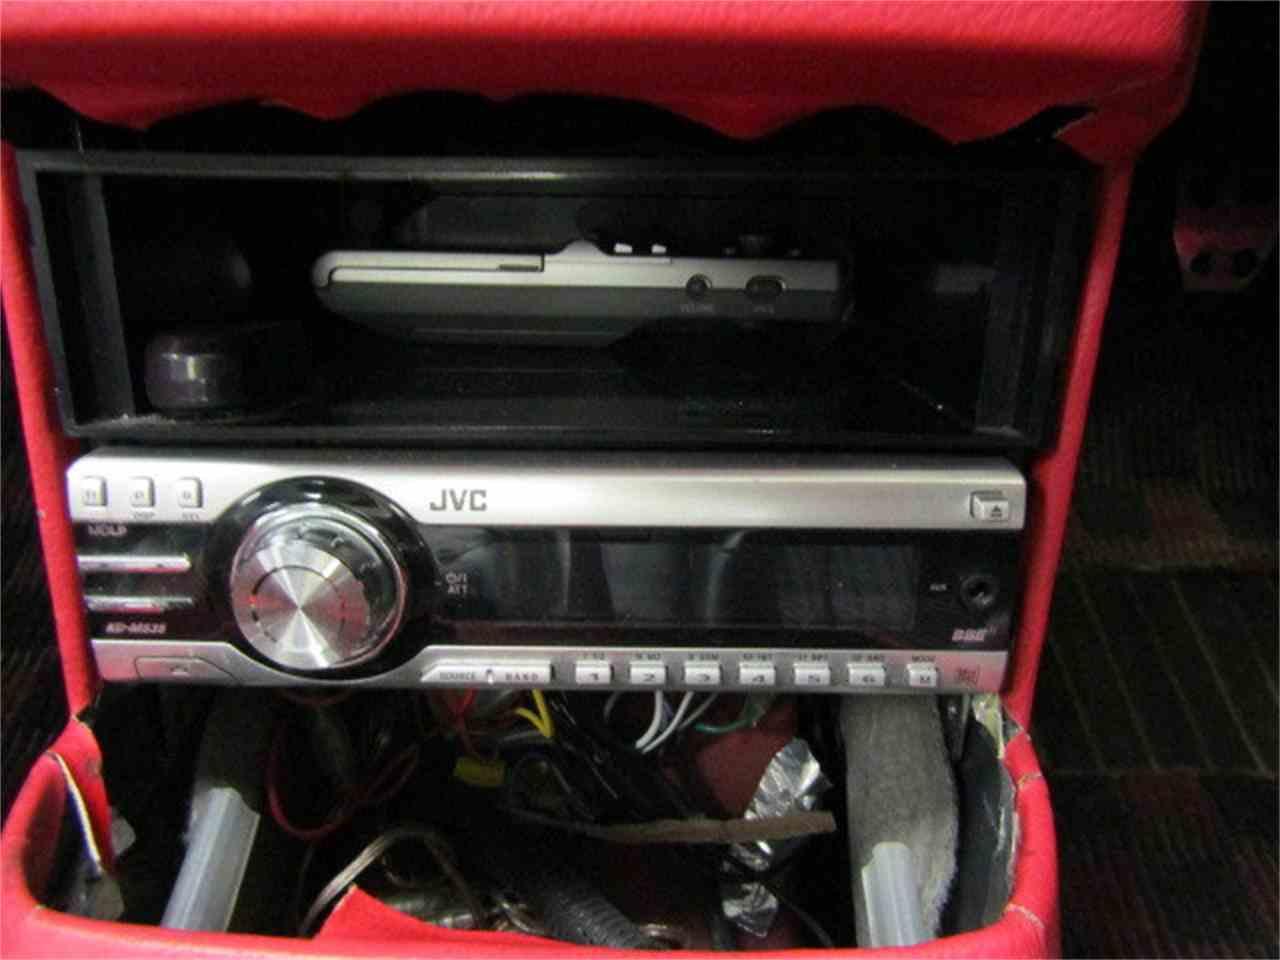 Large Picture of 1991 Honda Beat located in Virginia - $5,959.00 - JL8F